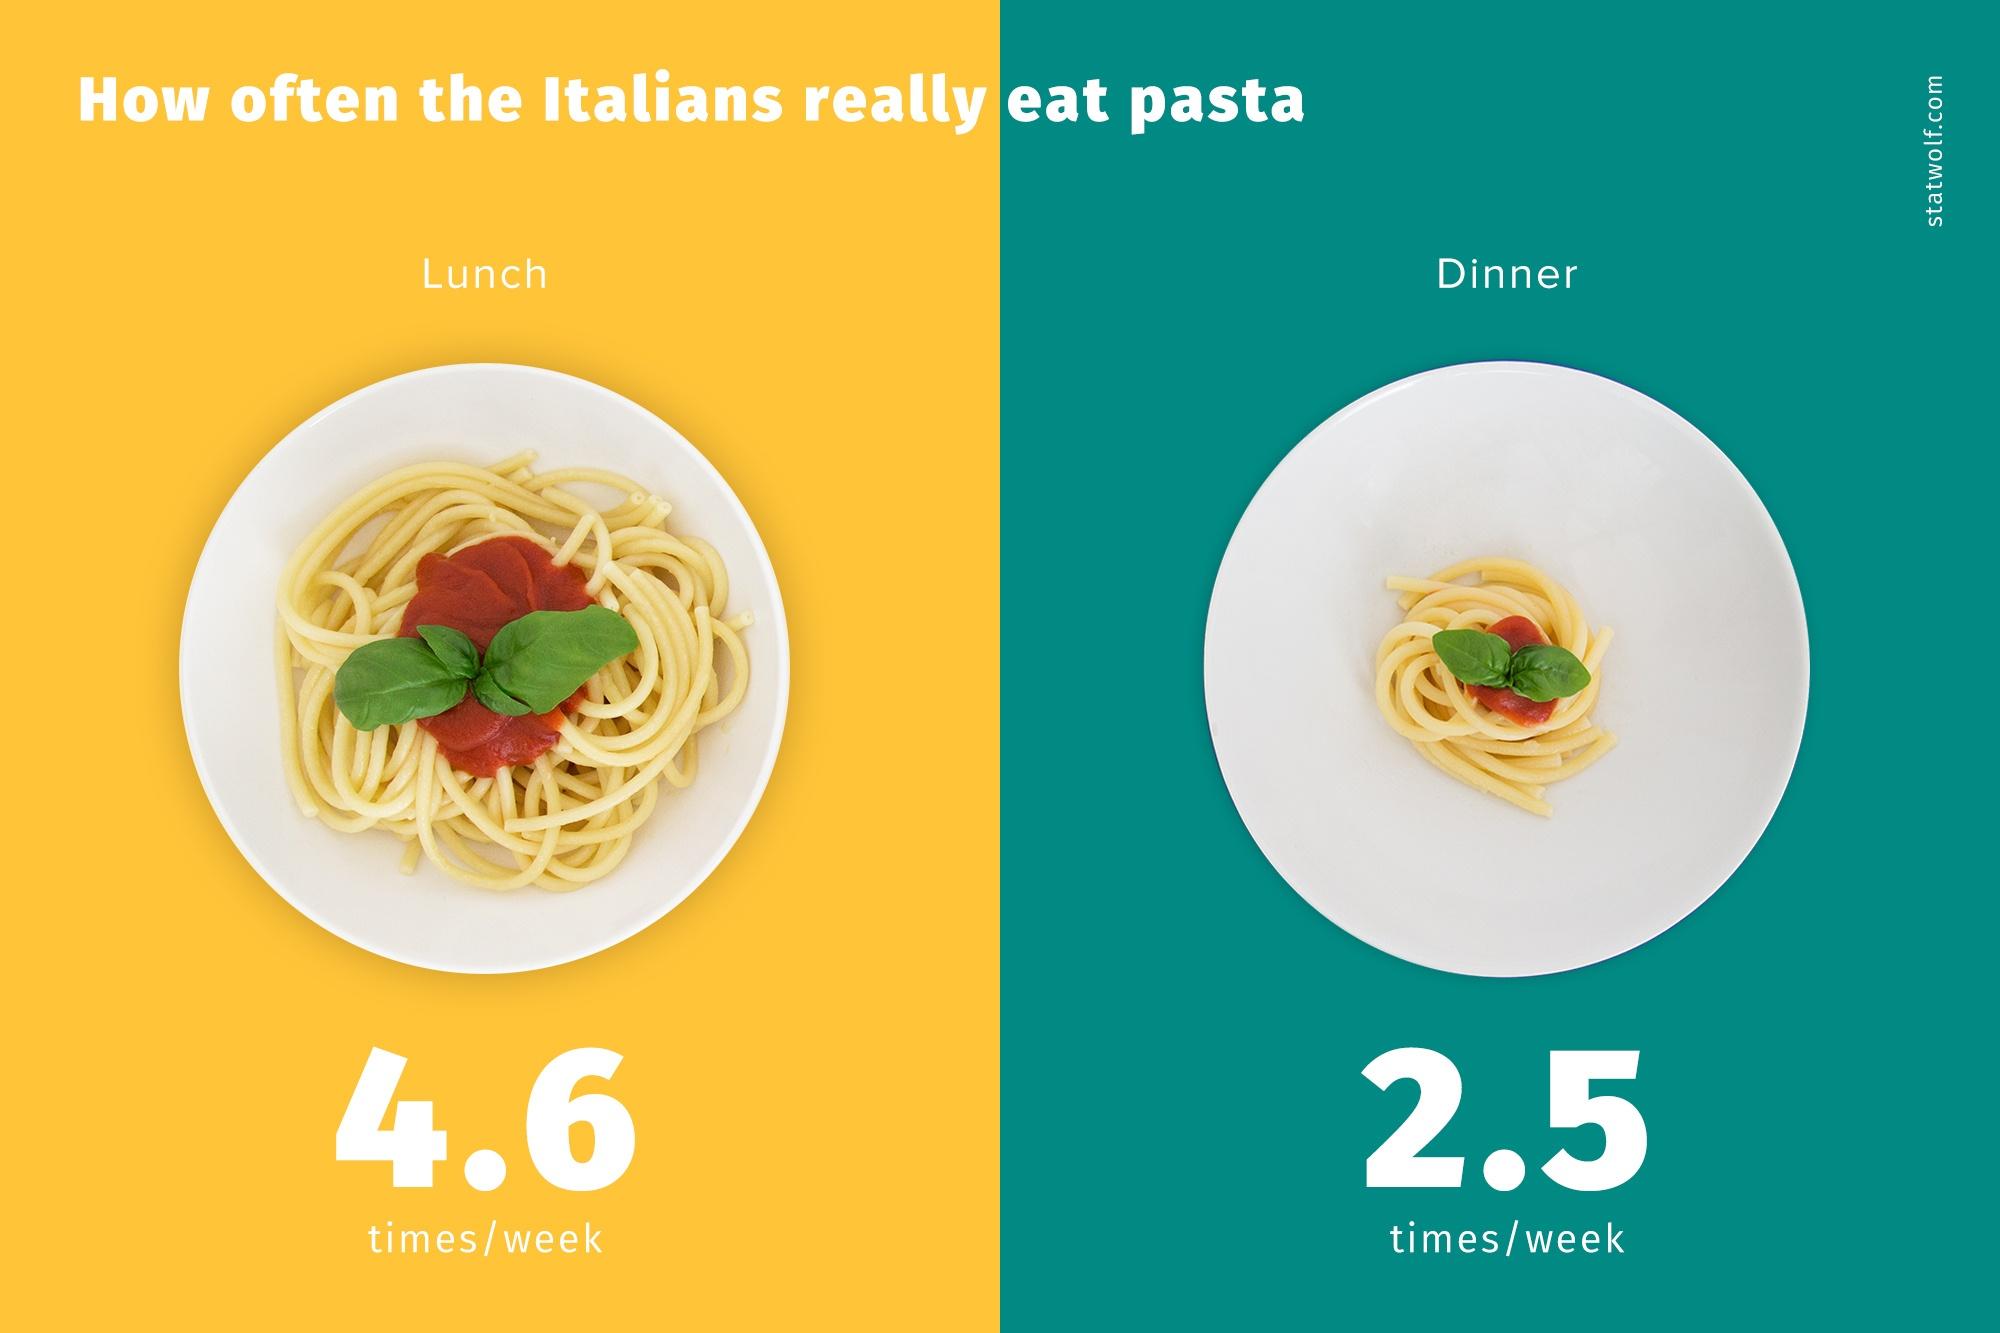 How Often The Italians Really Eat Pasta